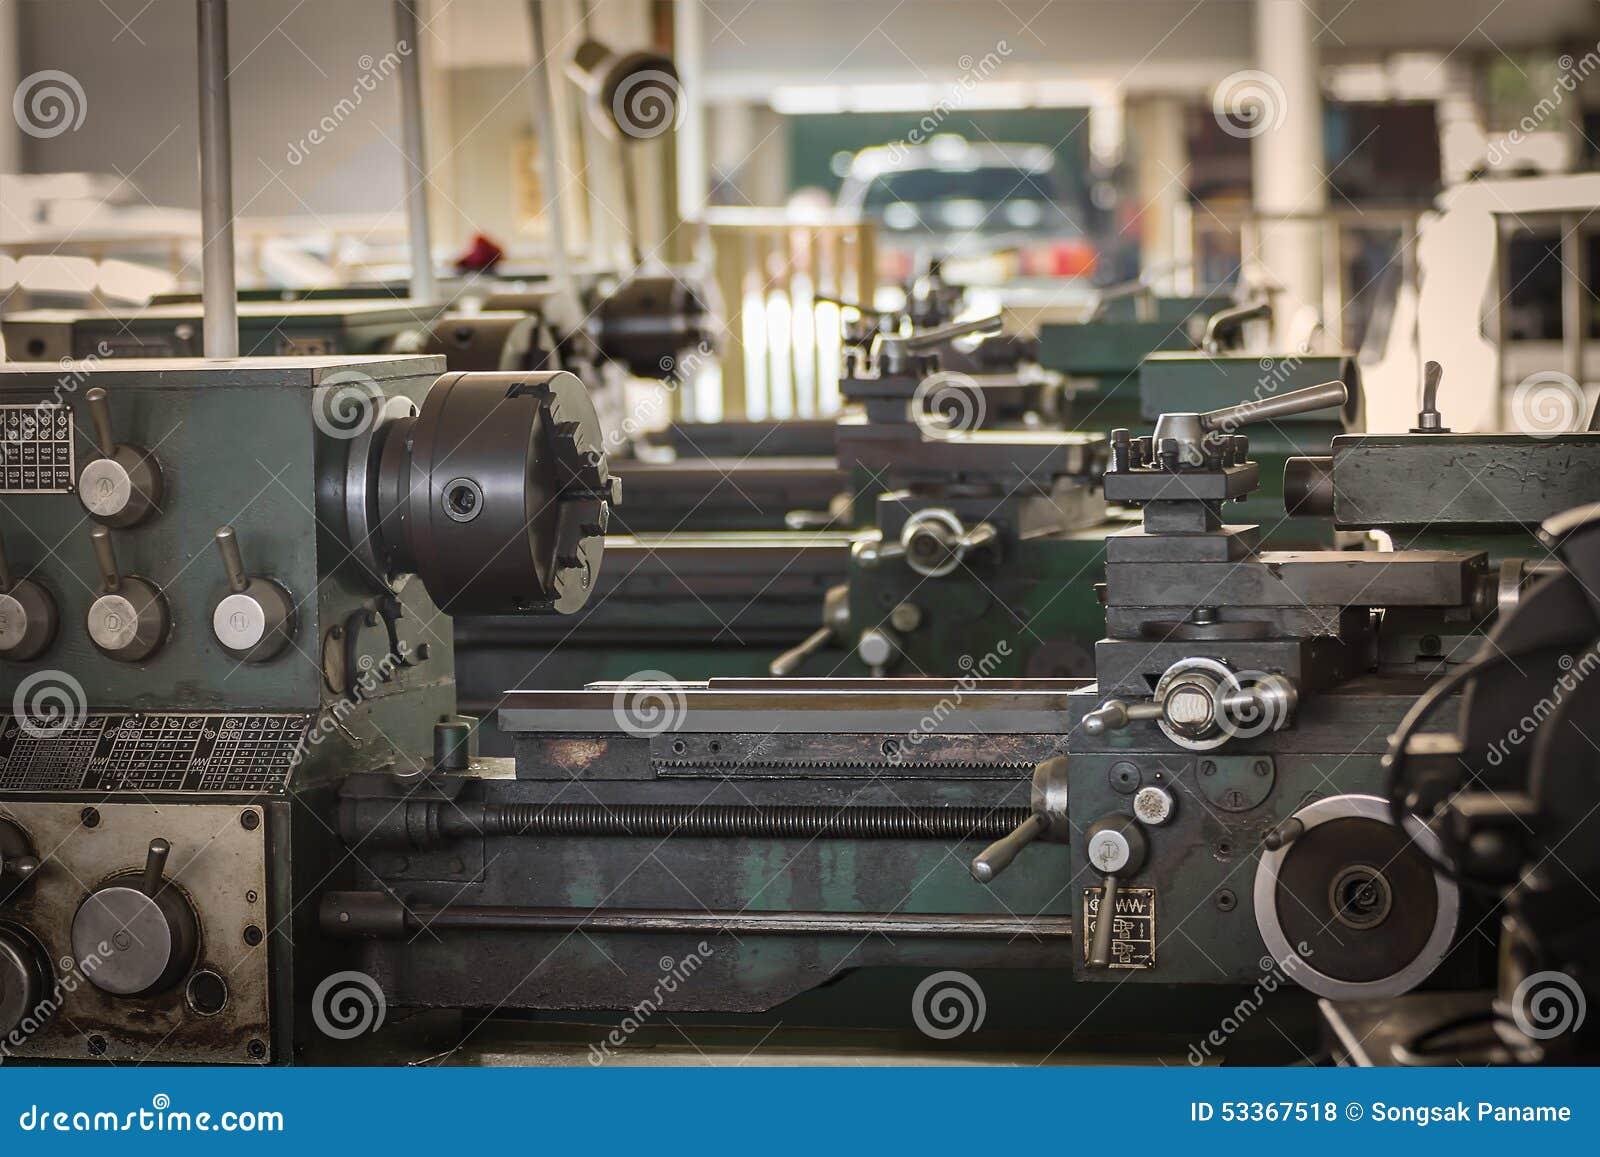 Old Metal Lathe Machine Stock Photo Image Of Plant